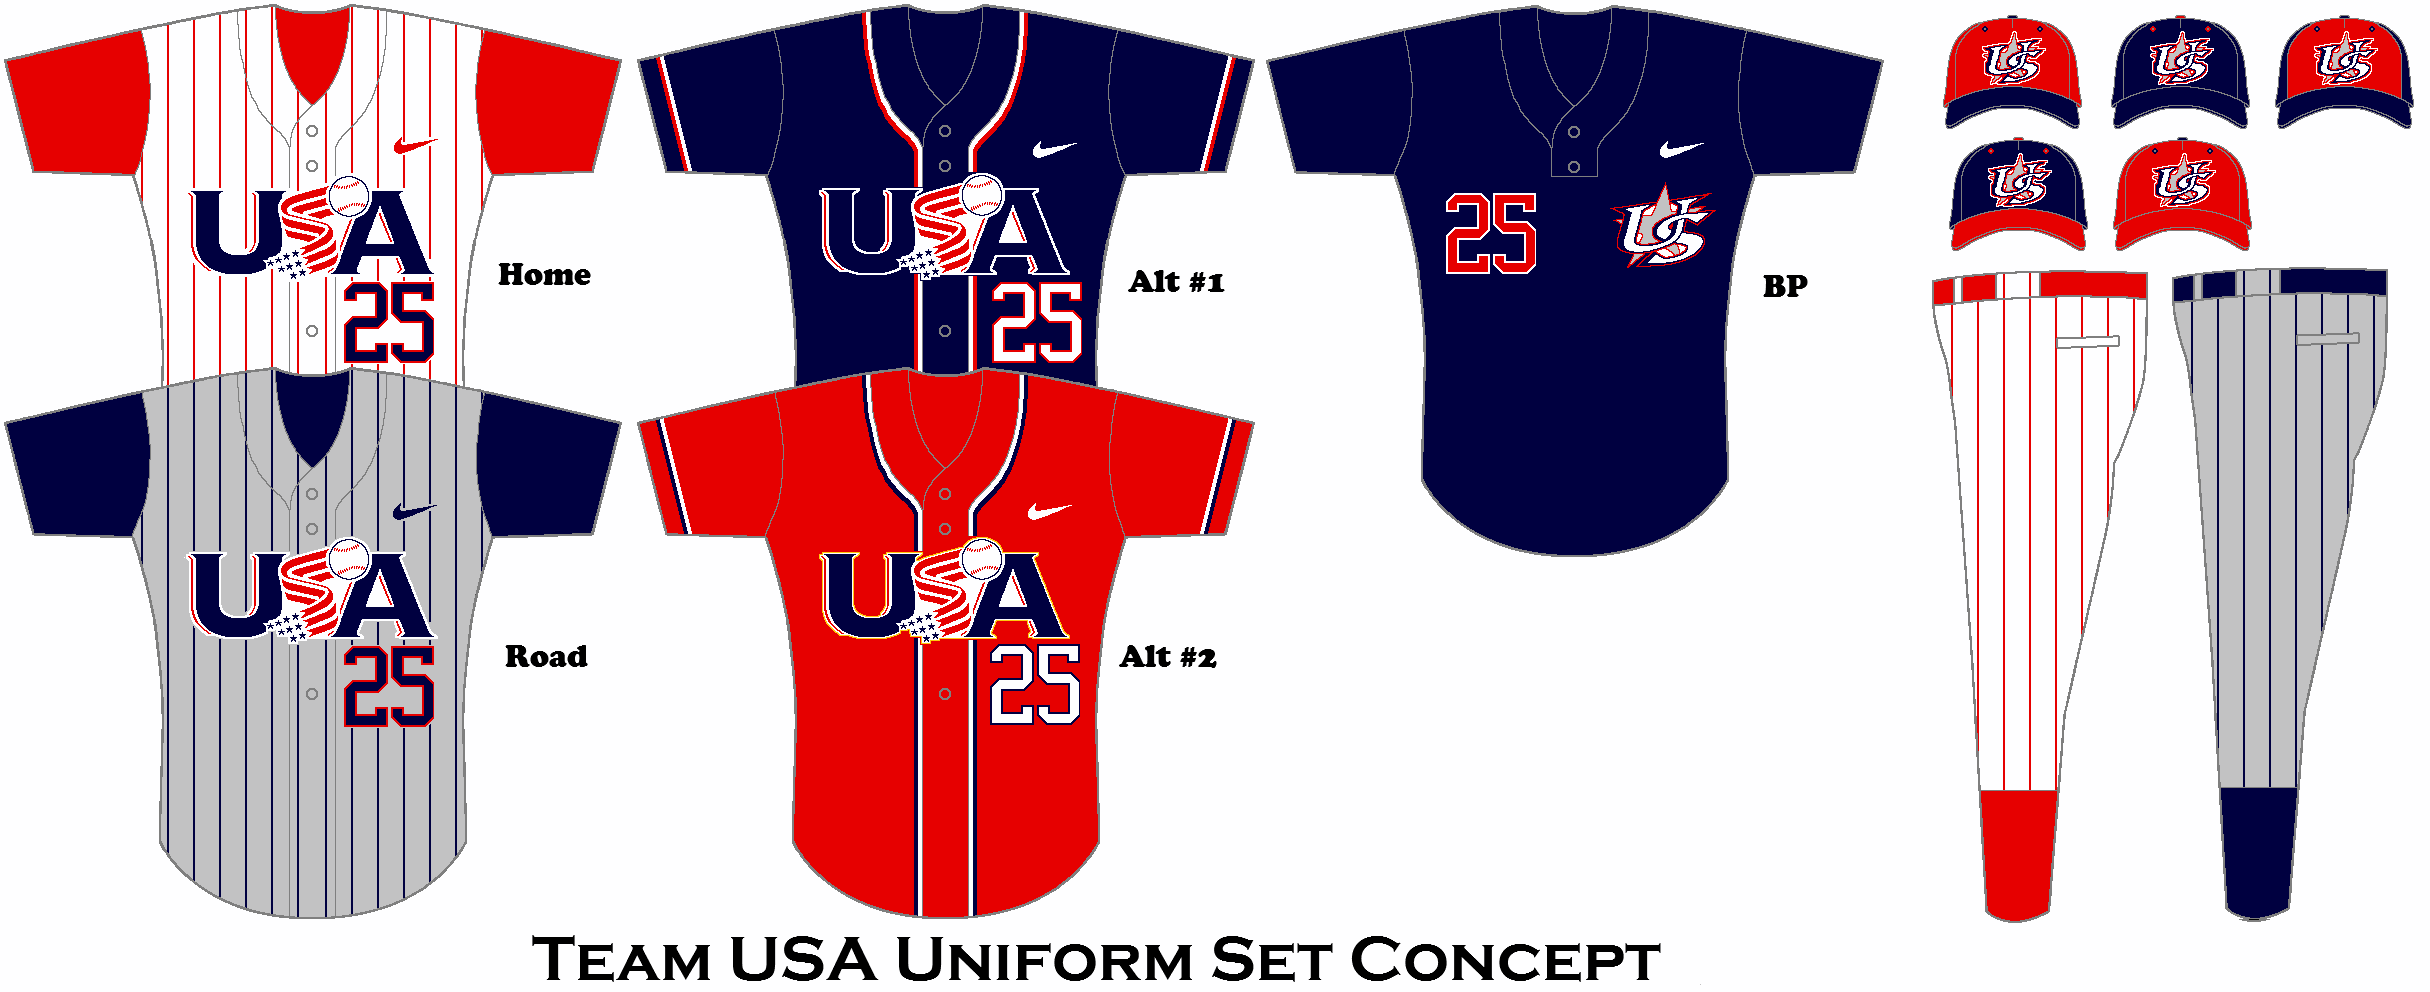 Team Usa Baseball Uniform Set Concept Usa Baseball Baseball Bag Baseball Uniform